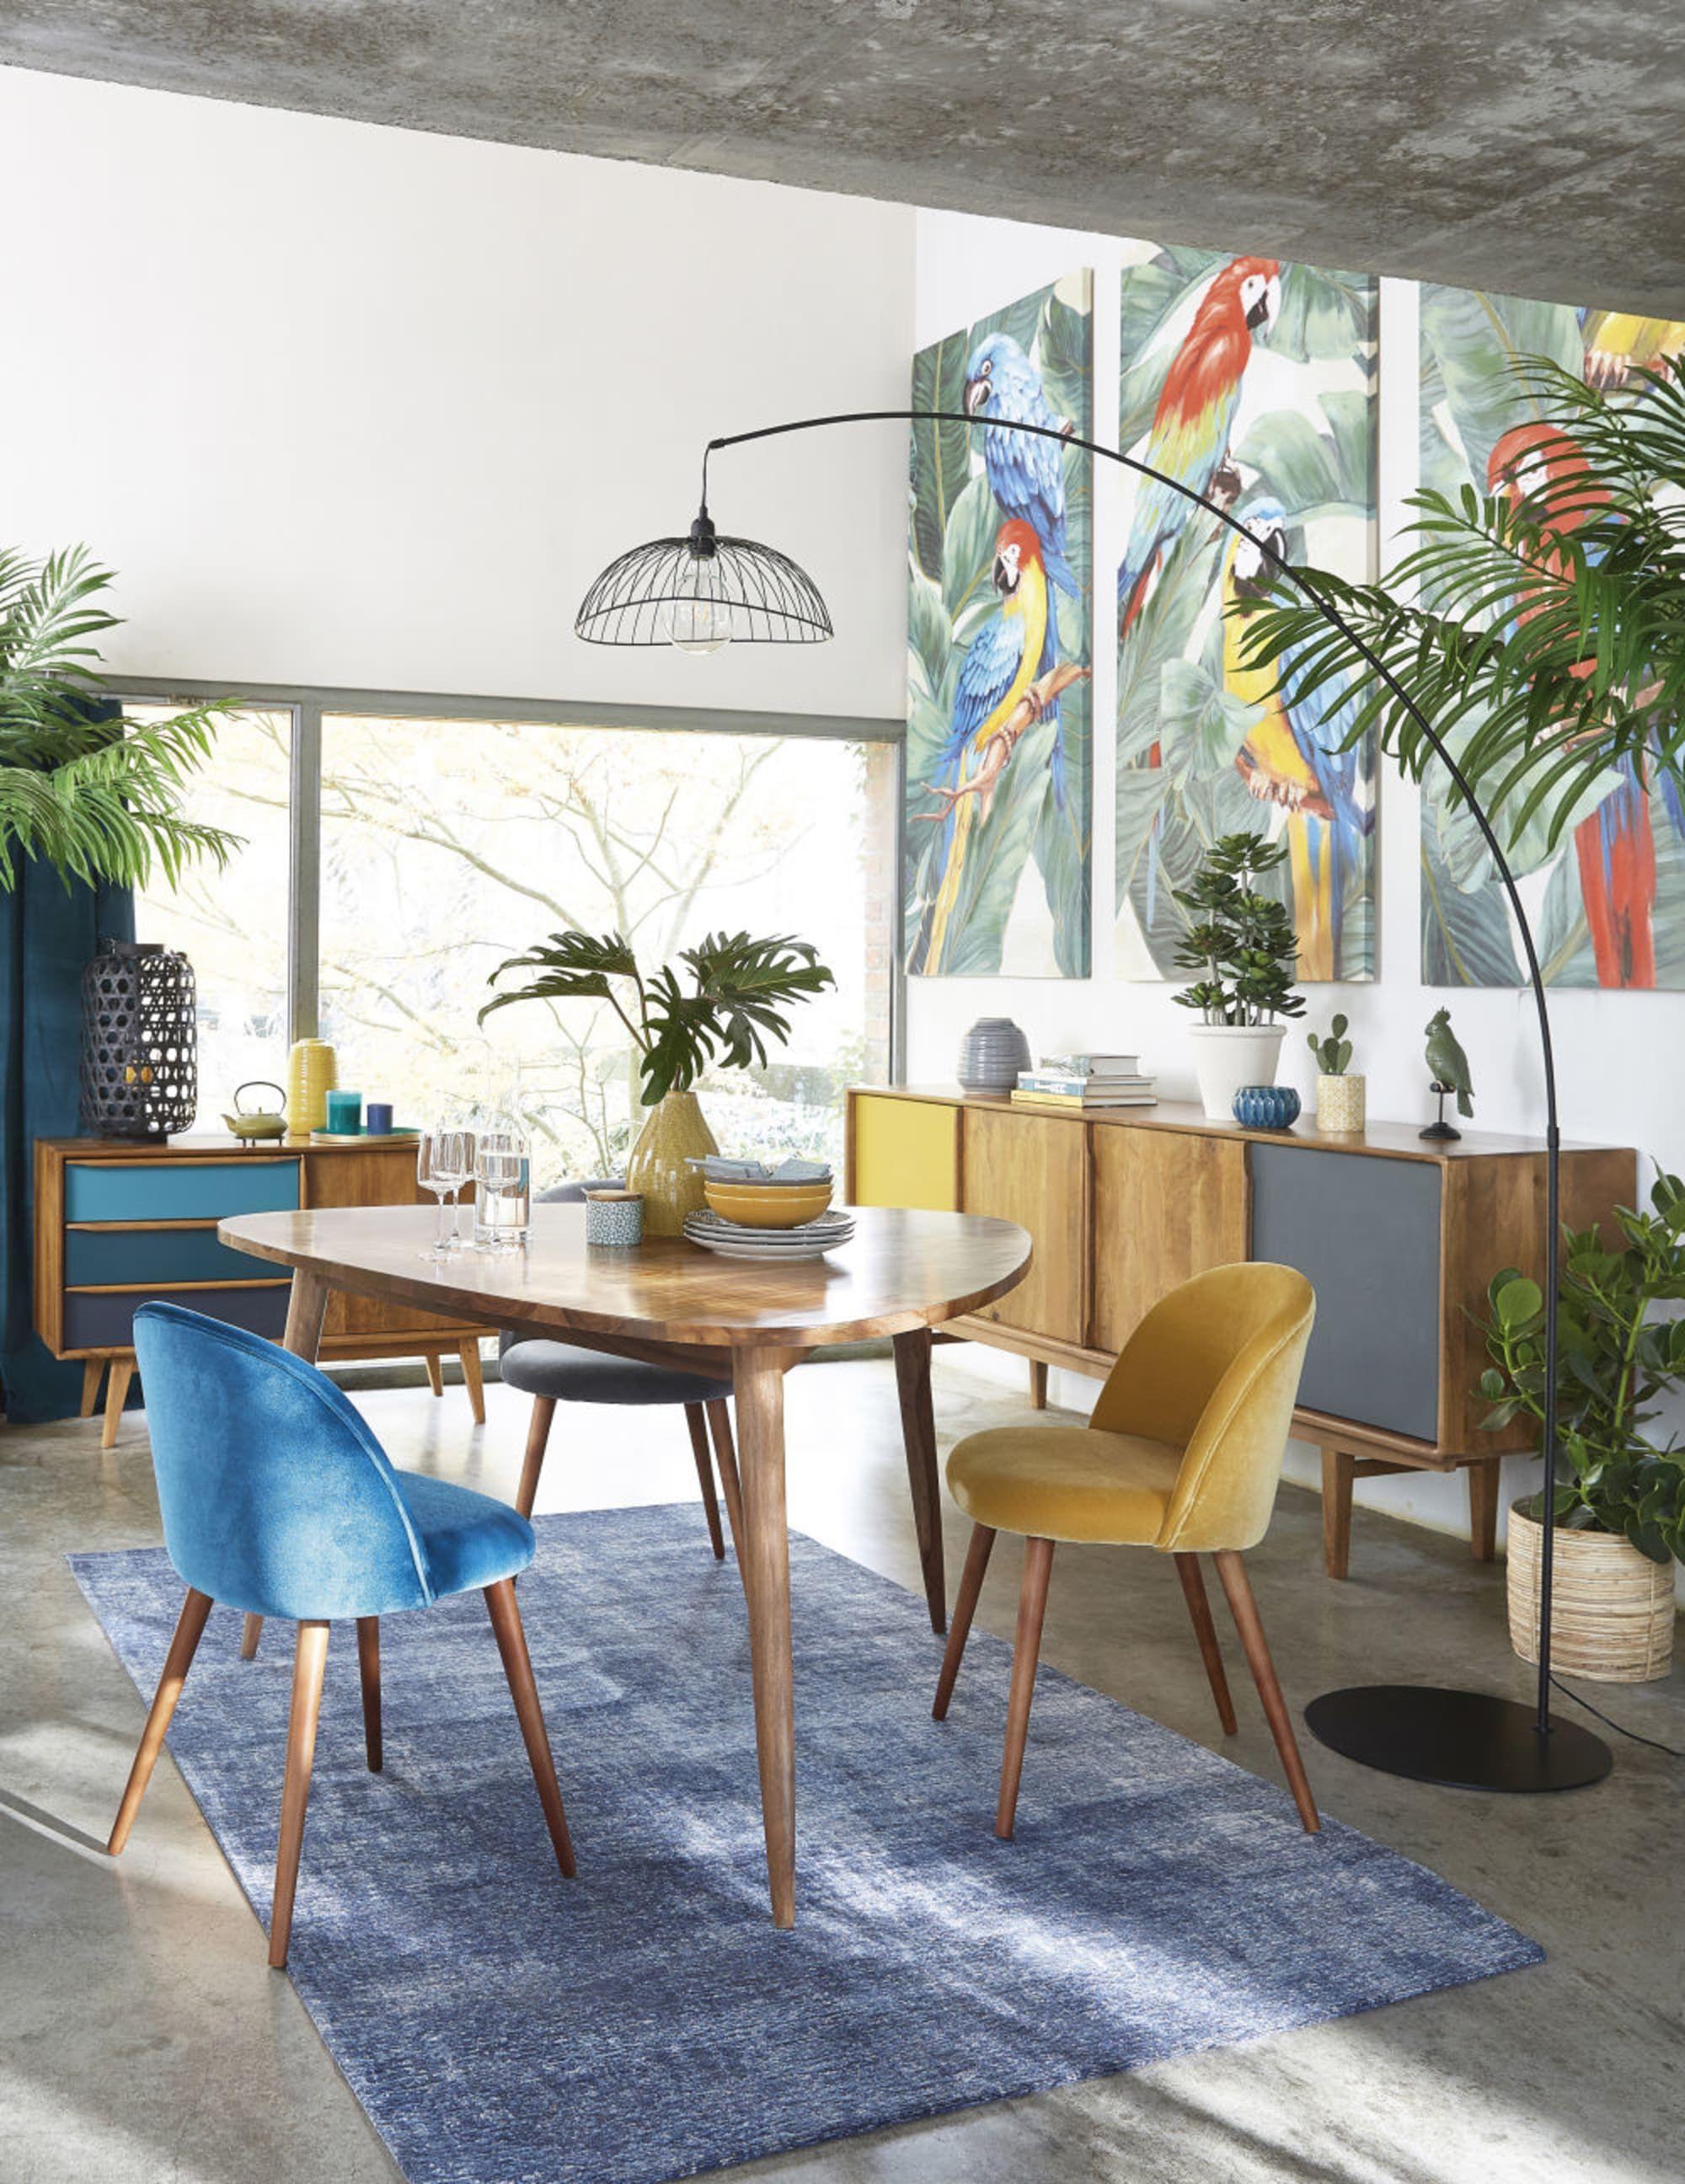 36+ Deco salle a manger vintage ideas in 2021